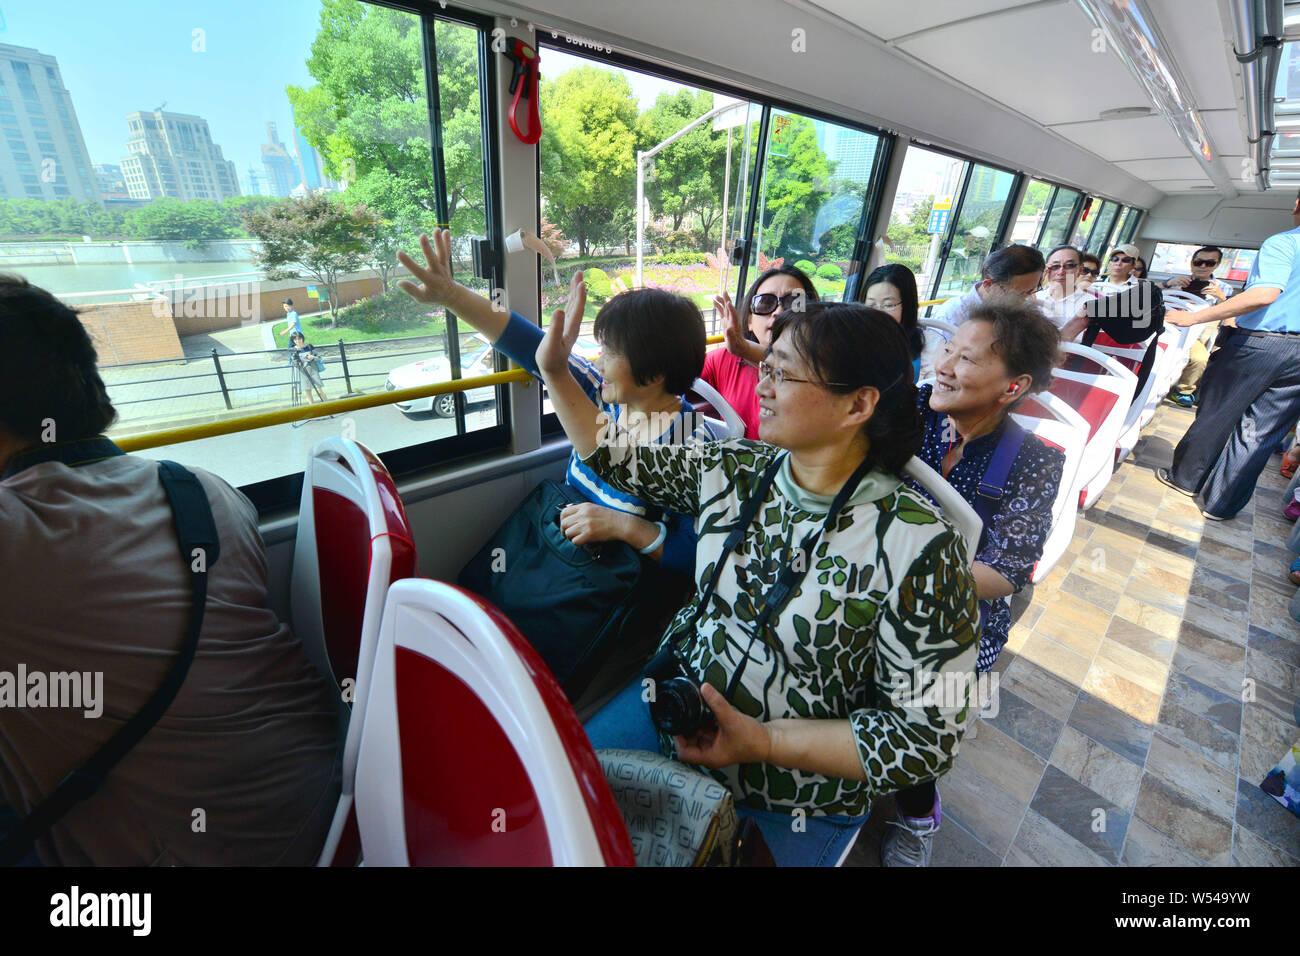 Shanghai China Tourist Attractions